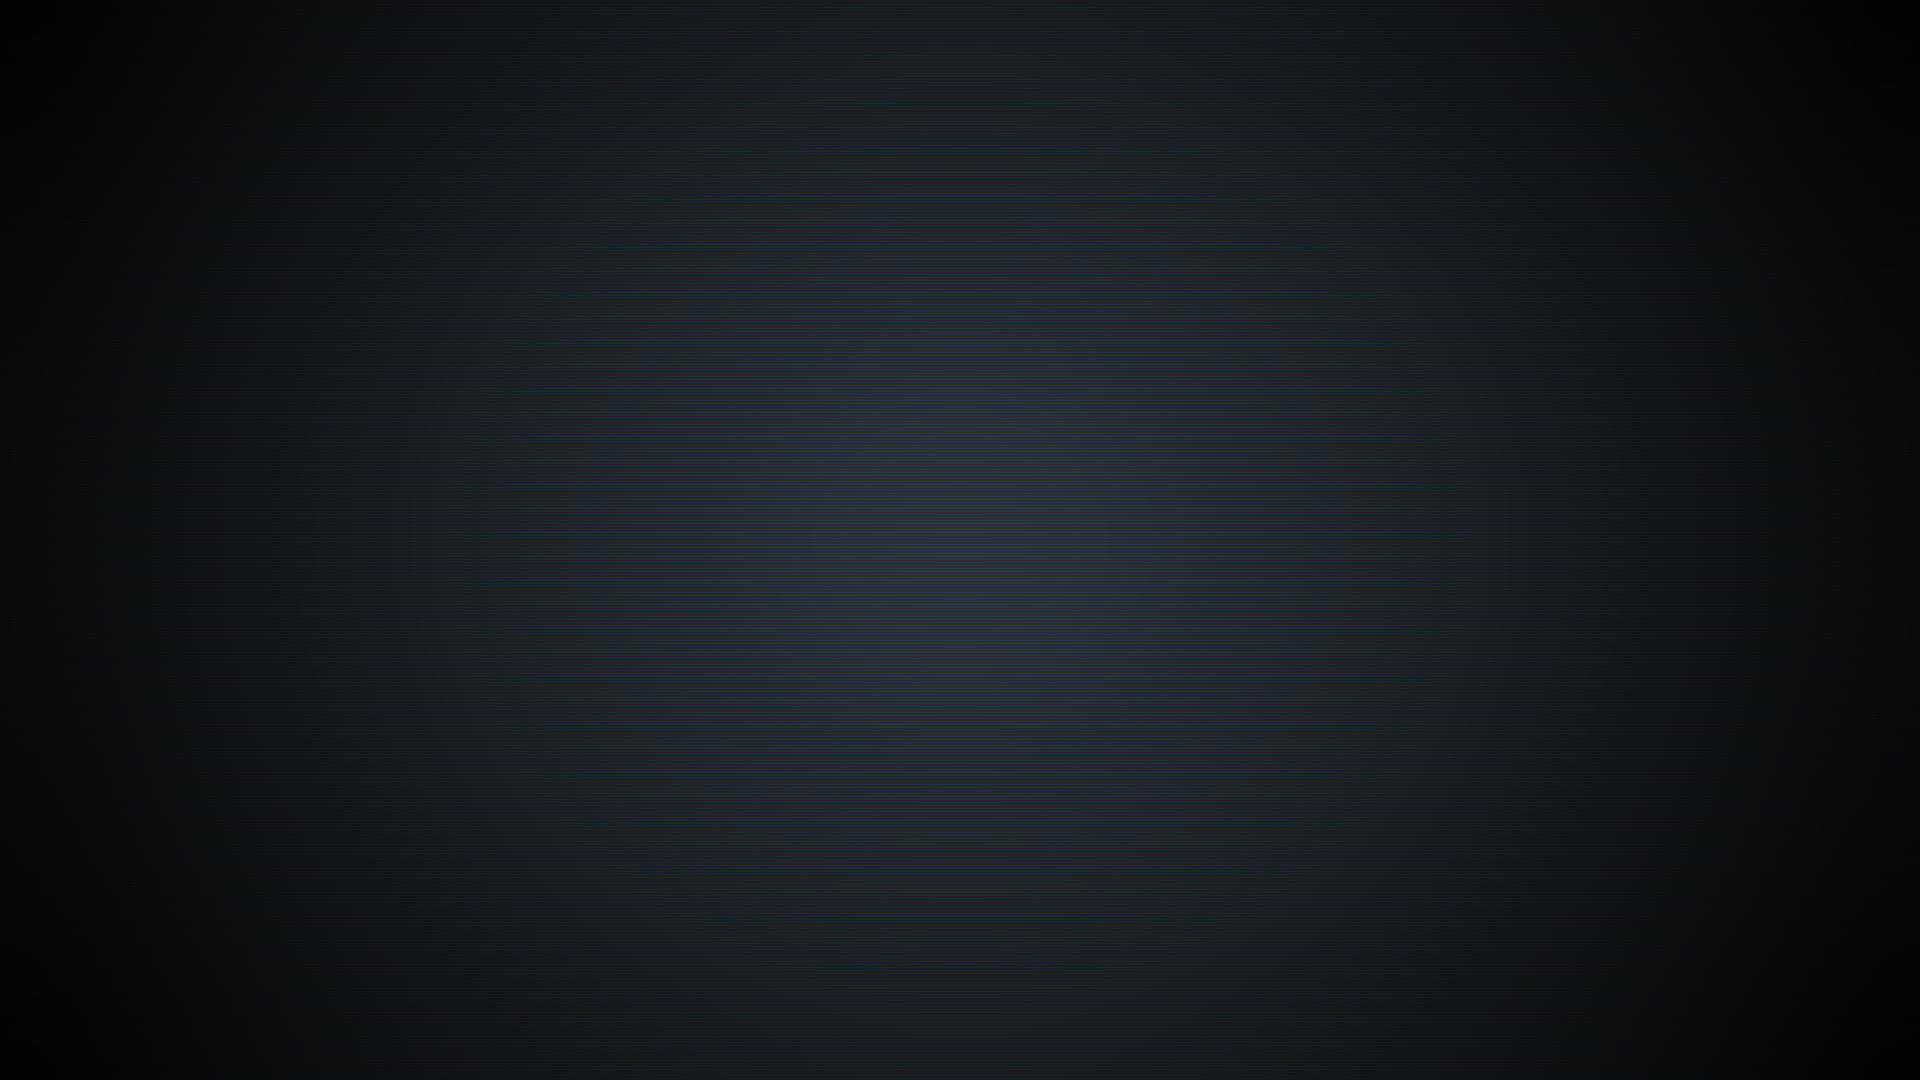 Index of shahndarcsnikki beta branchdatapngosd 1920x1080